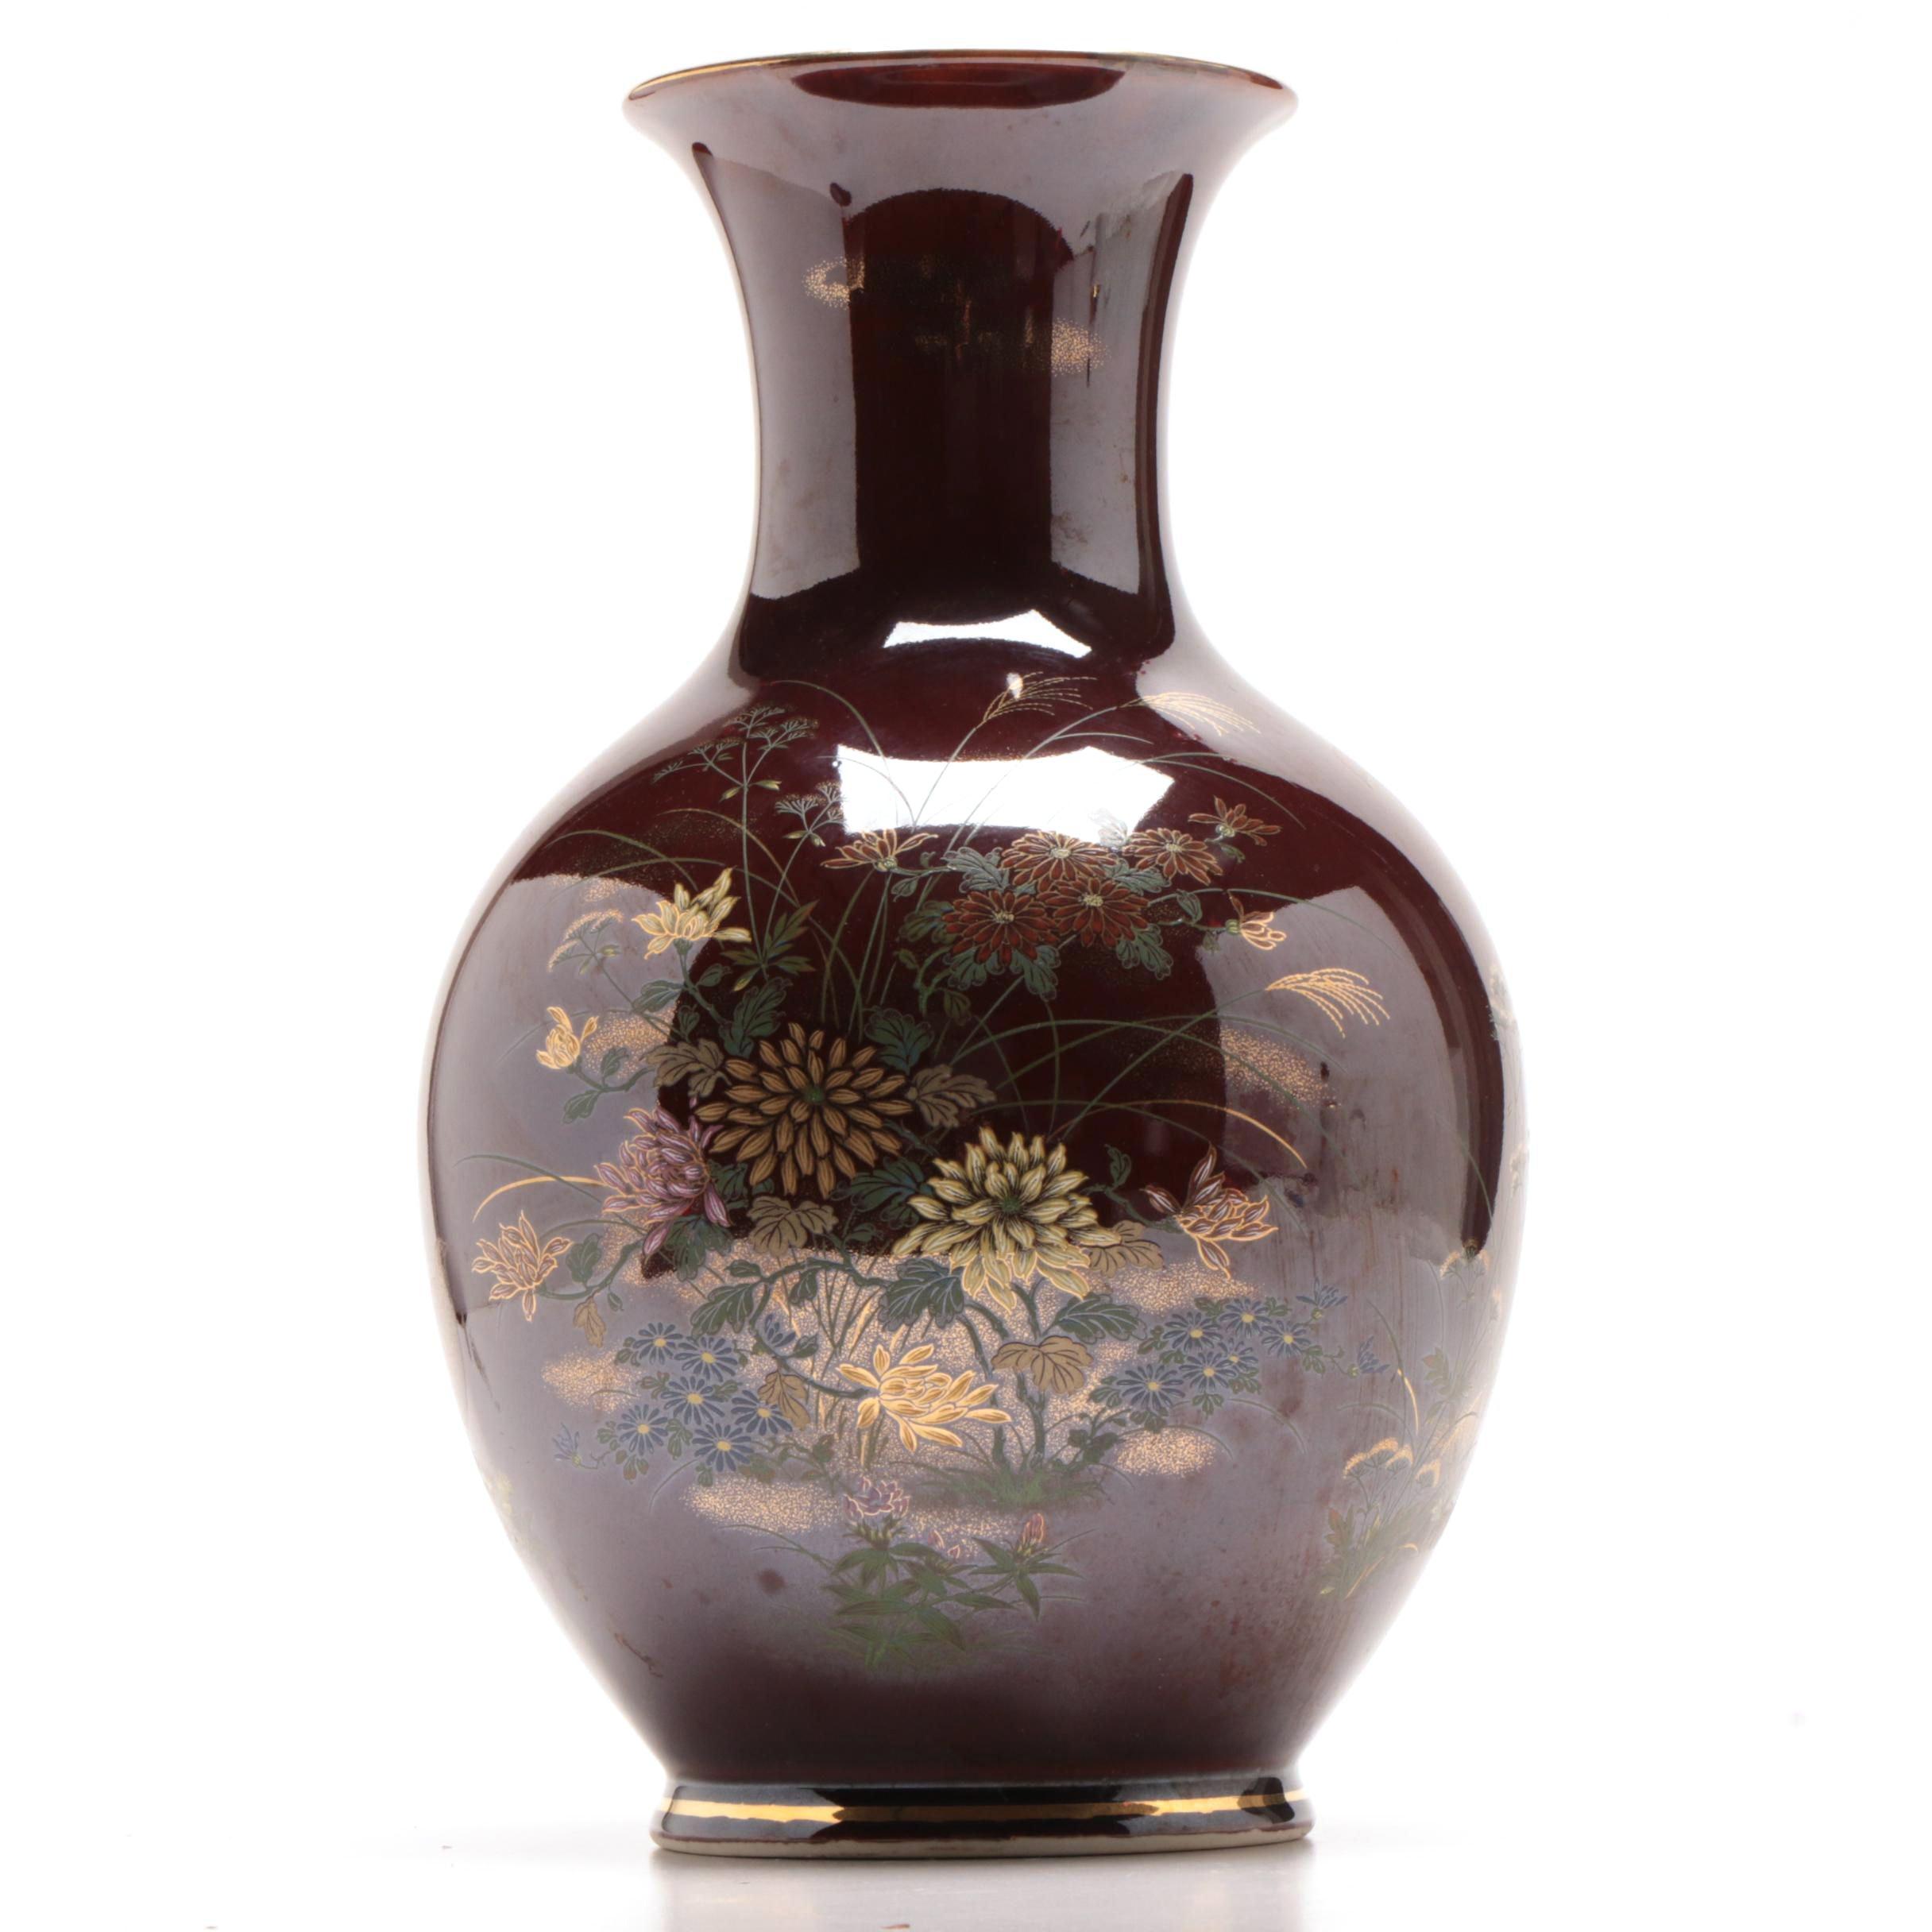 Japanese Porcelain Vase Depicting Quail Birds and Flowers